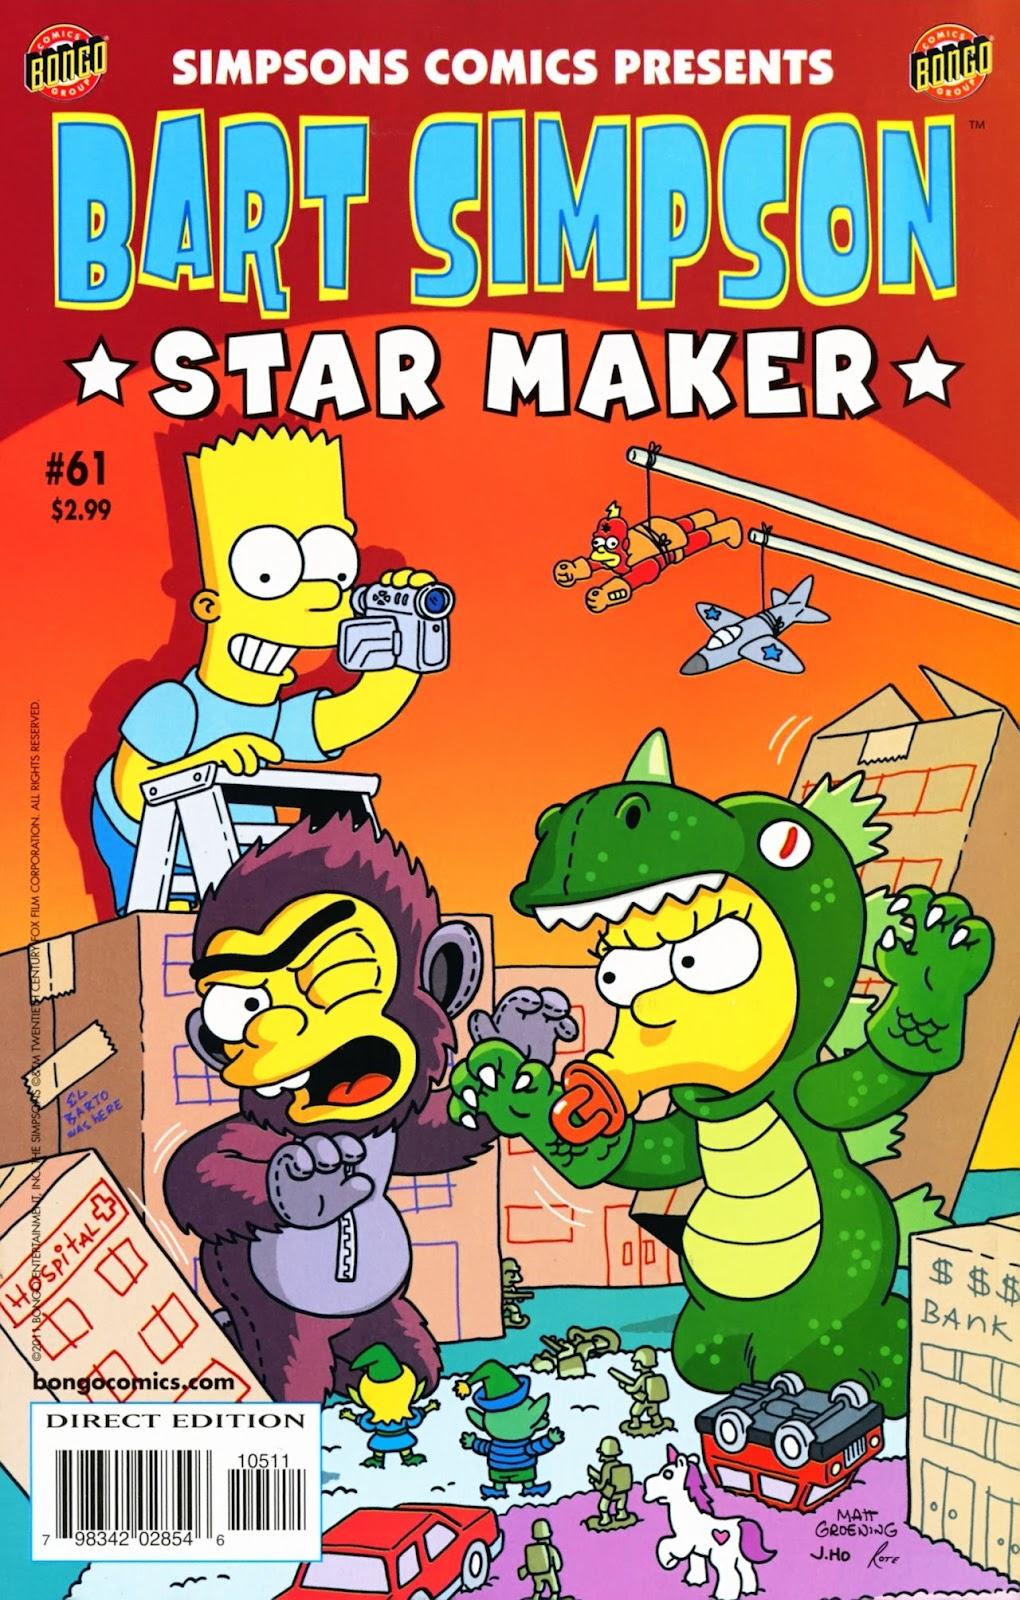 Simpsons Comics Presents Bart Simpson 61 Page 1